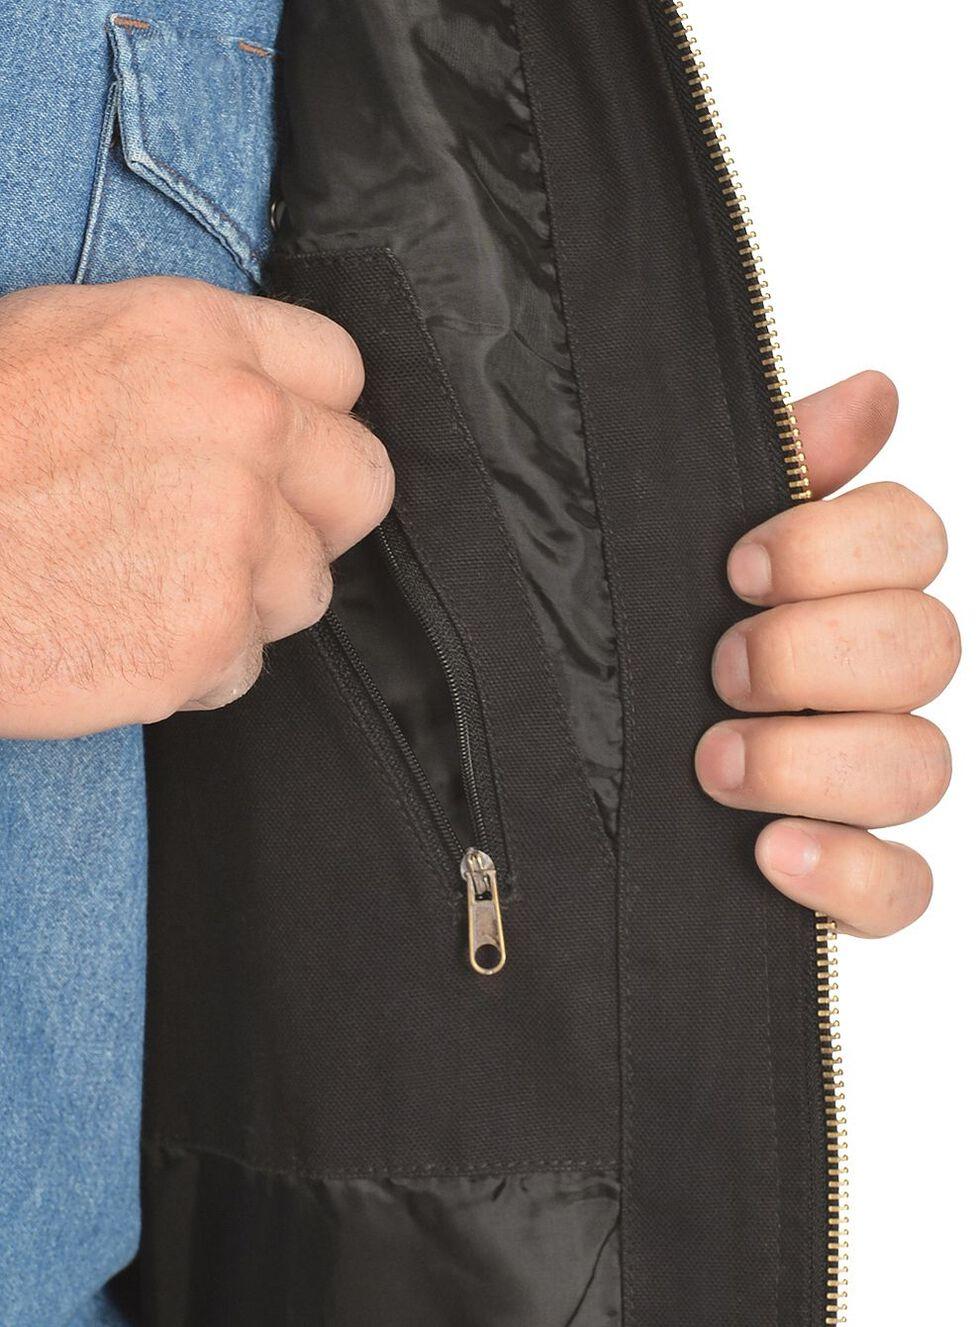 Gibson Trading Co. Men's Quilted Vest, Black, hi-res